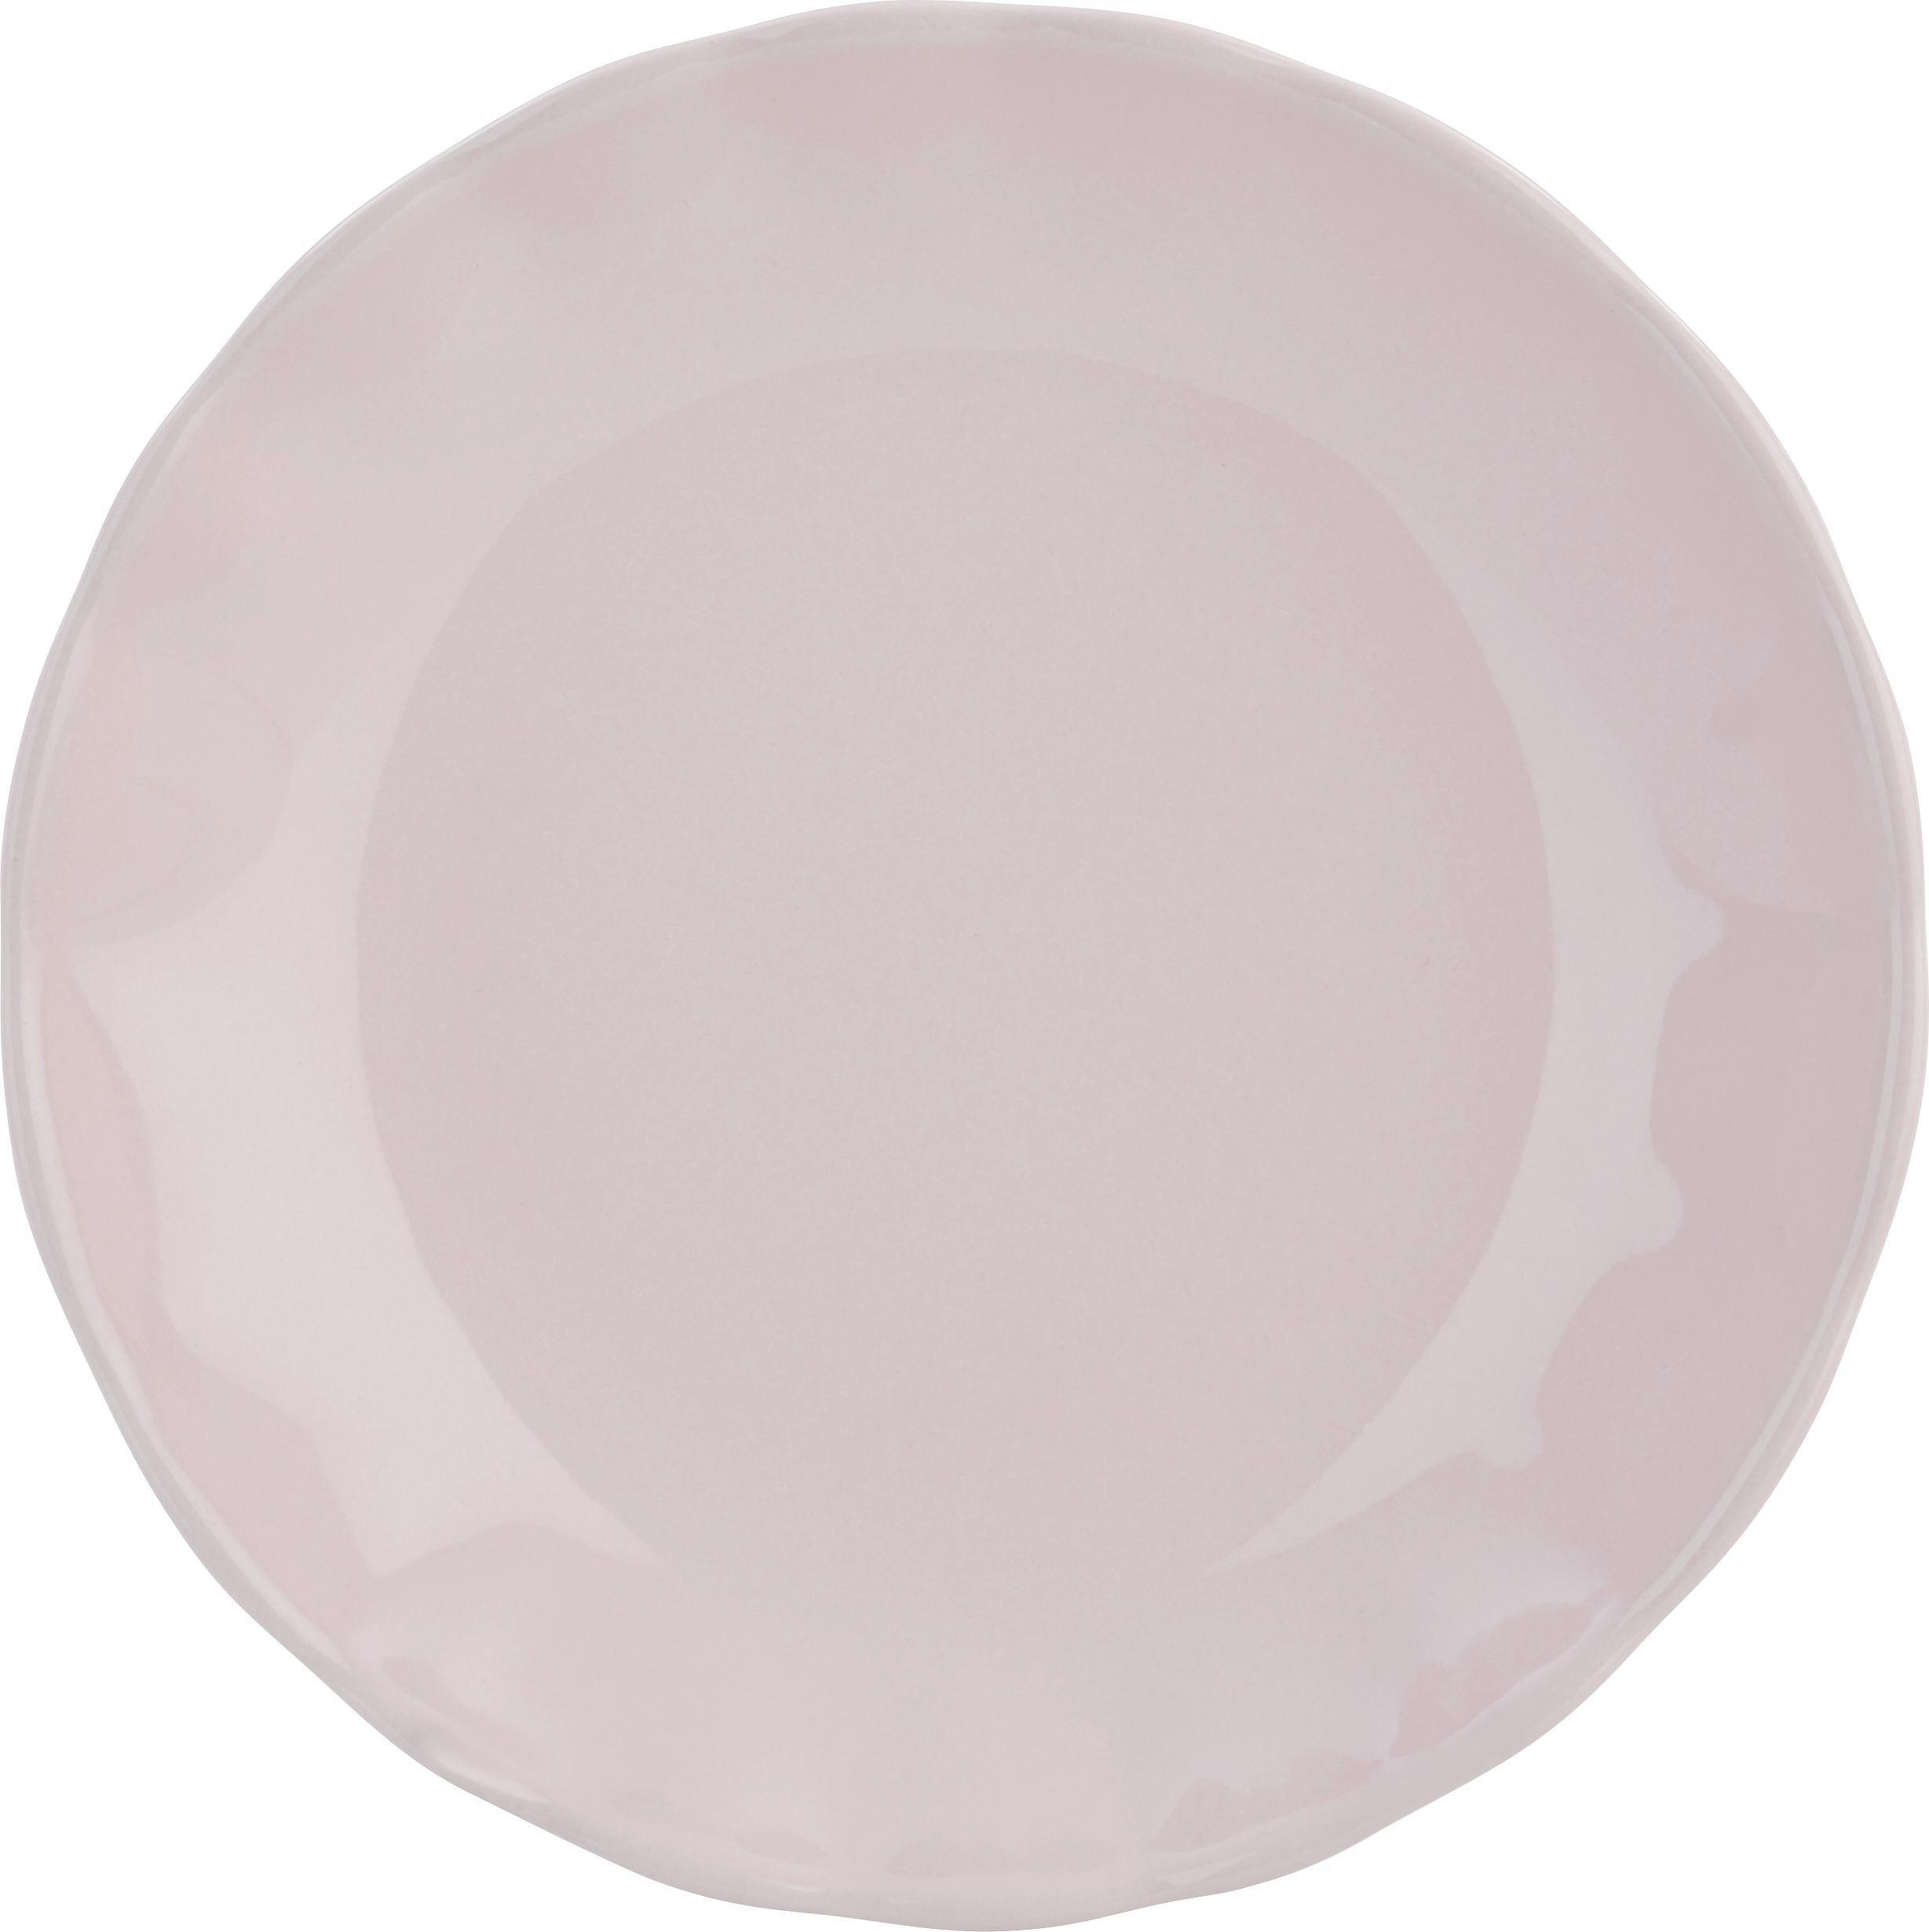 Suppenteller Pauline in Rosa - Rosa, ROMANTIK / LANDHAUS, Keramik (25cm) - ZANDIARA